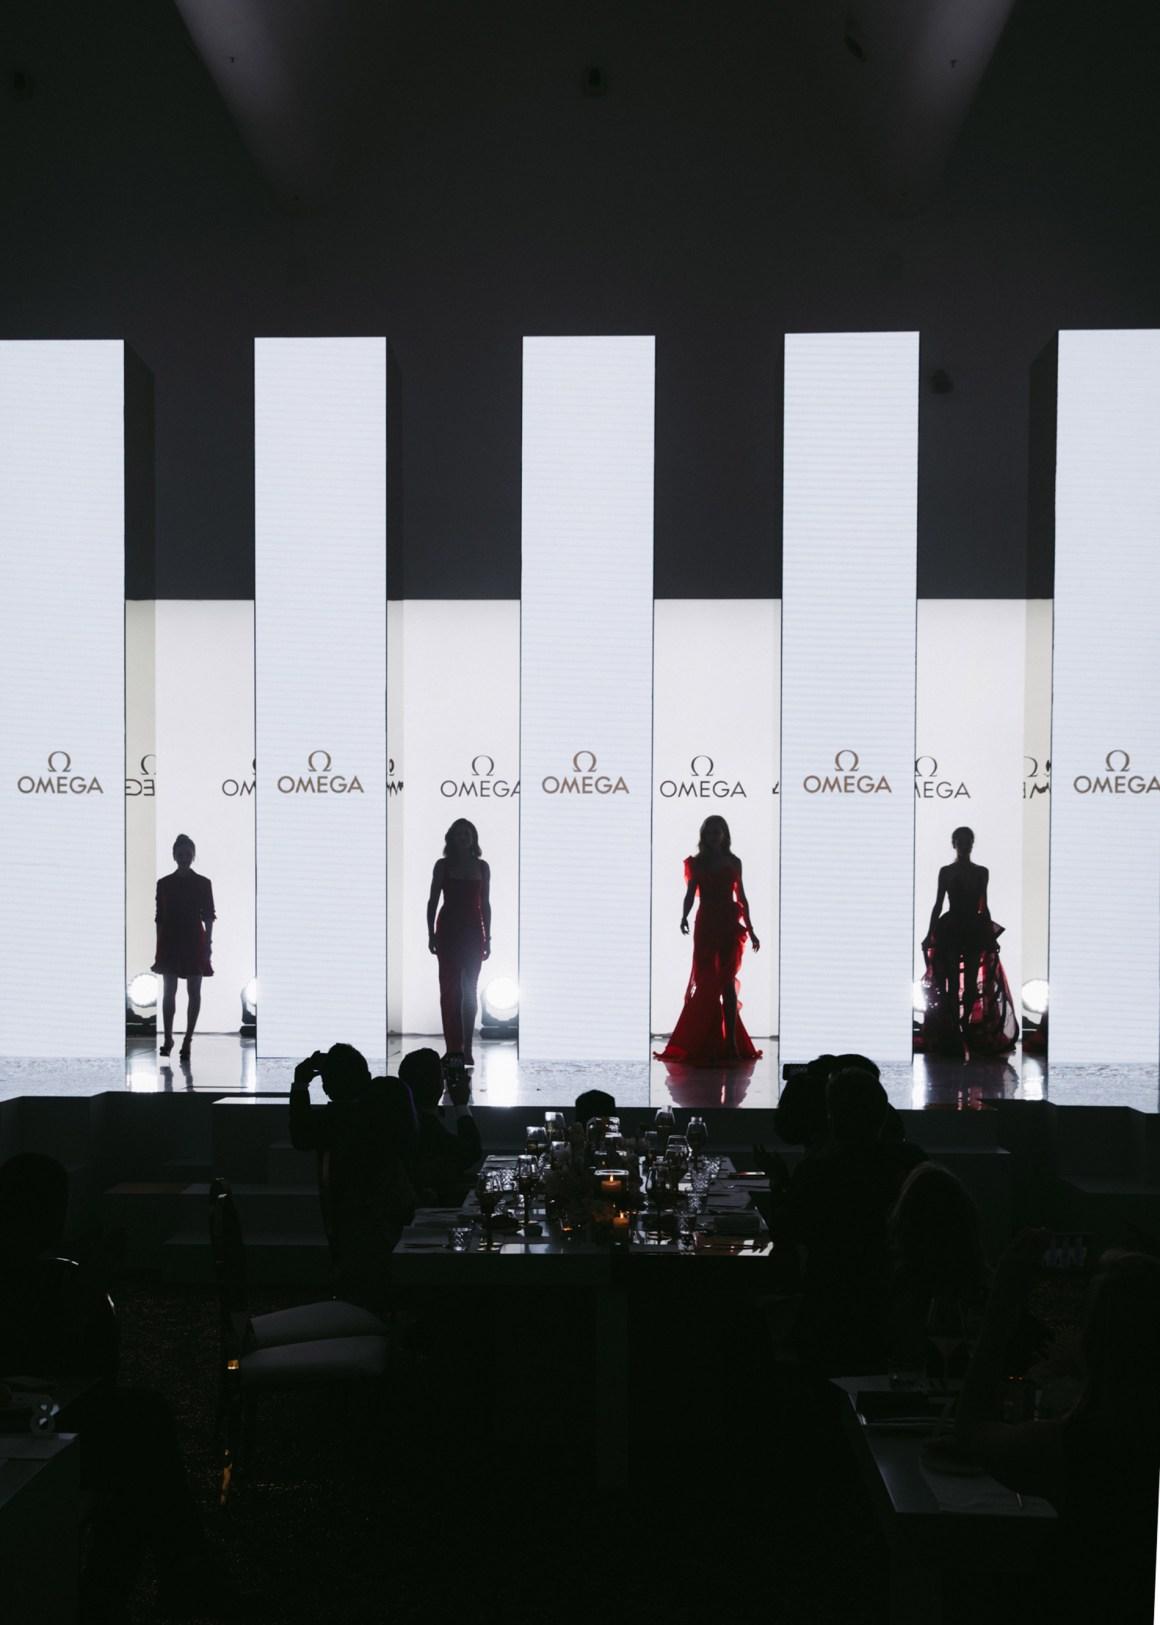 3. Liu Shishi, Cindy Crawford, Nicole Kidman, Alessandra Ambrosio_LR.jpg